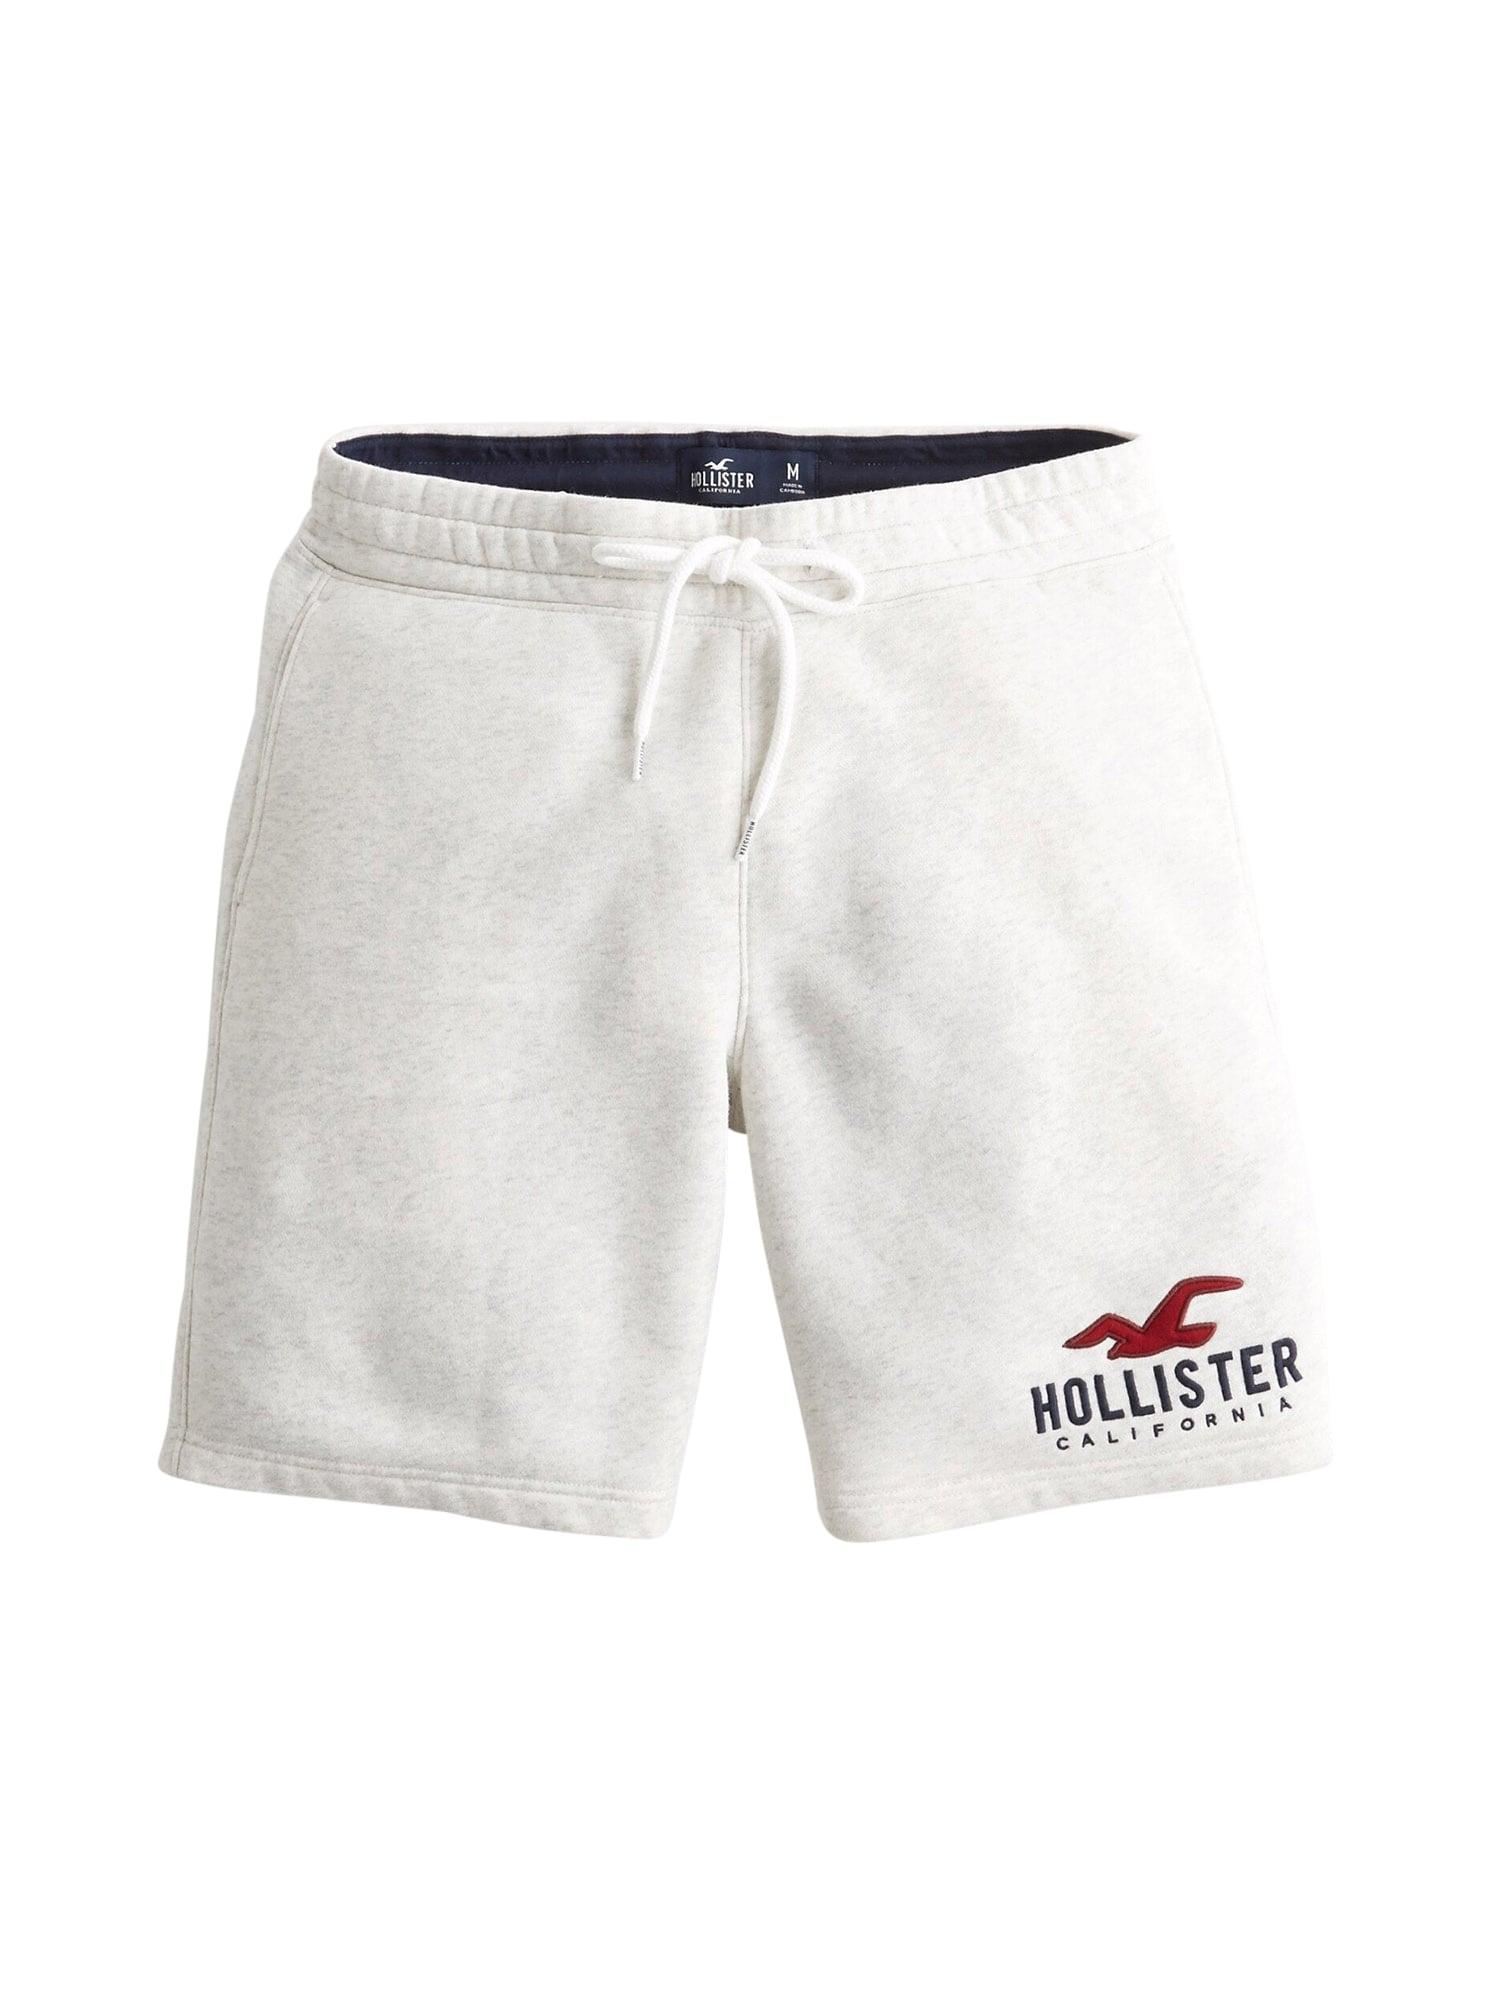 HOLLISTER Kelnės margai balta